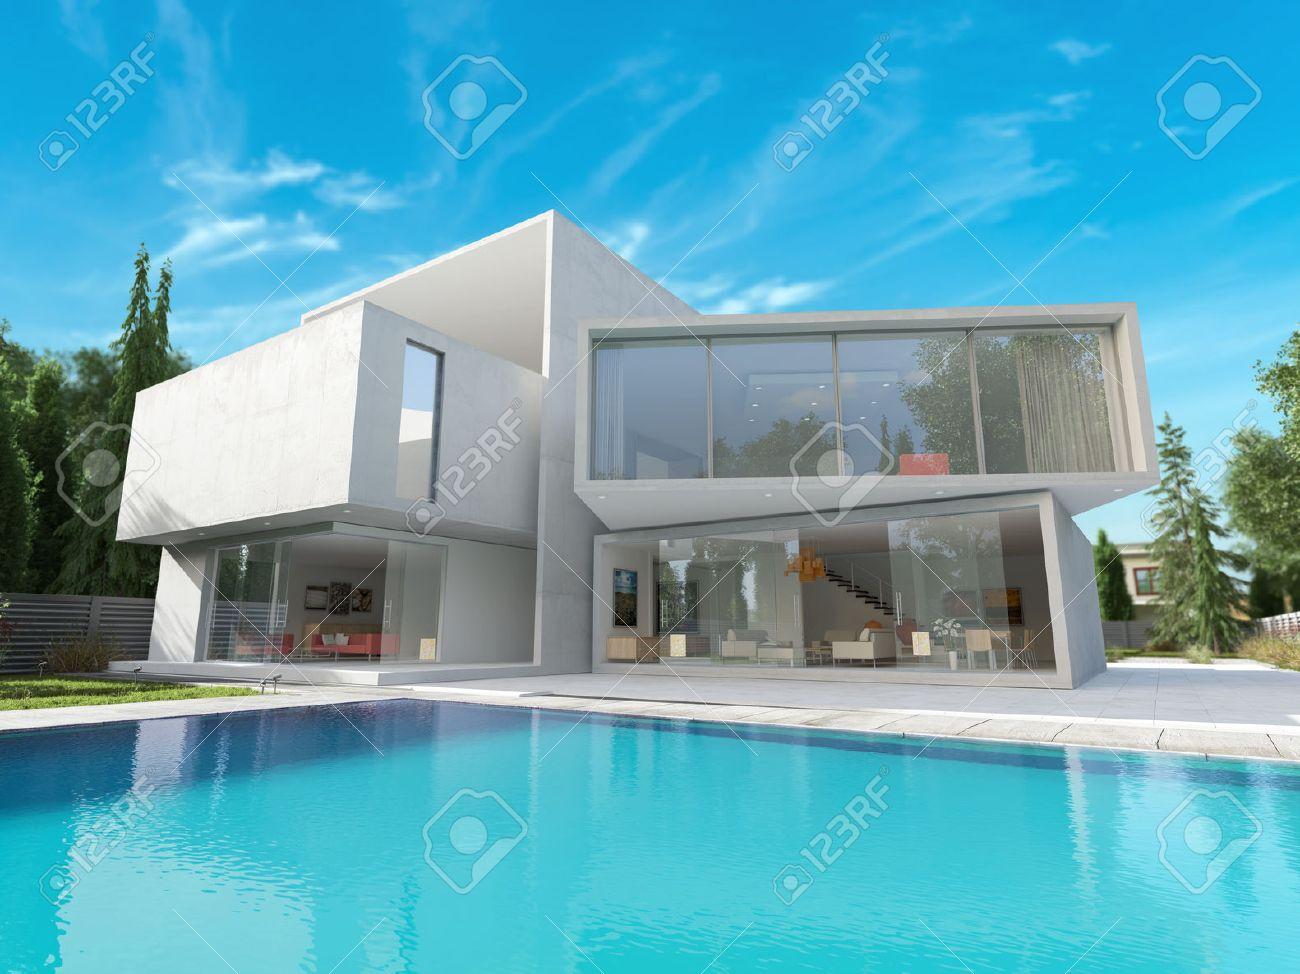 Extern Syn PÃ¥ En Modern Hus Med Pool Royalty-Fria Stockfoton ...